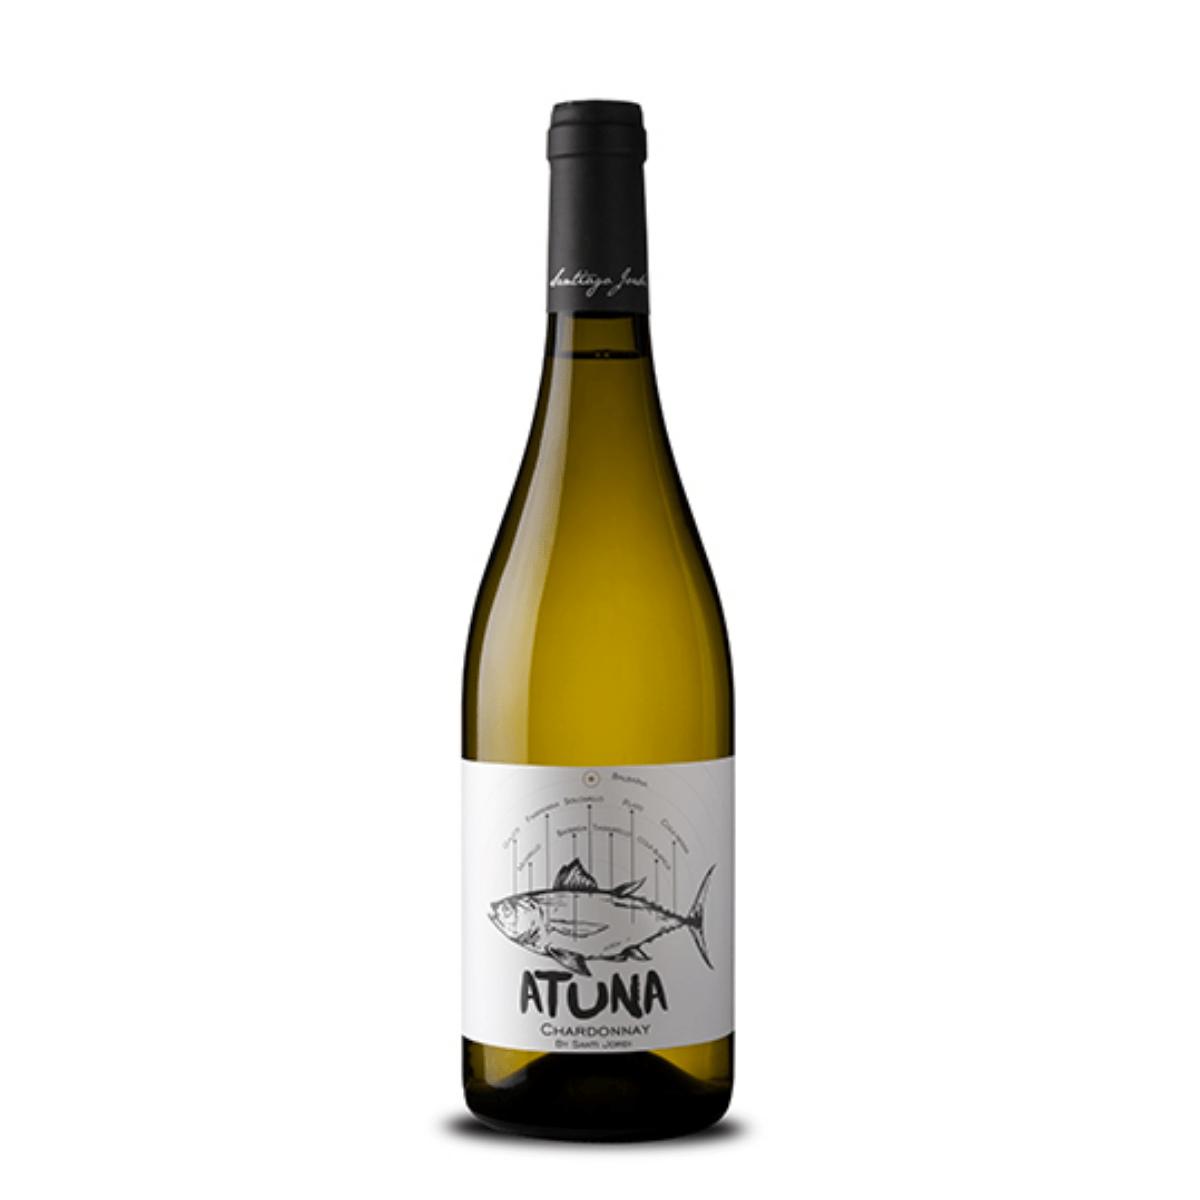 Atuna Chardonnay